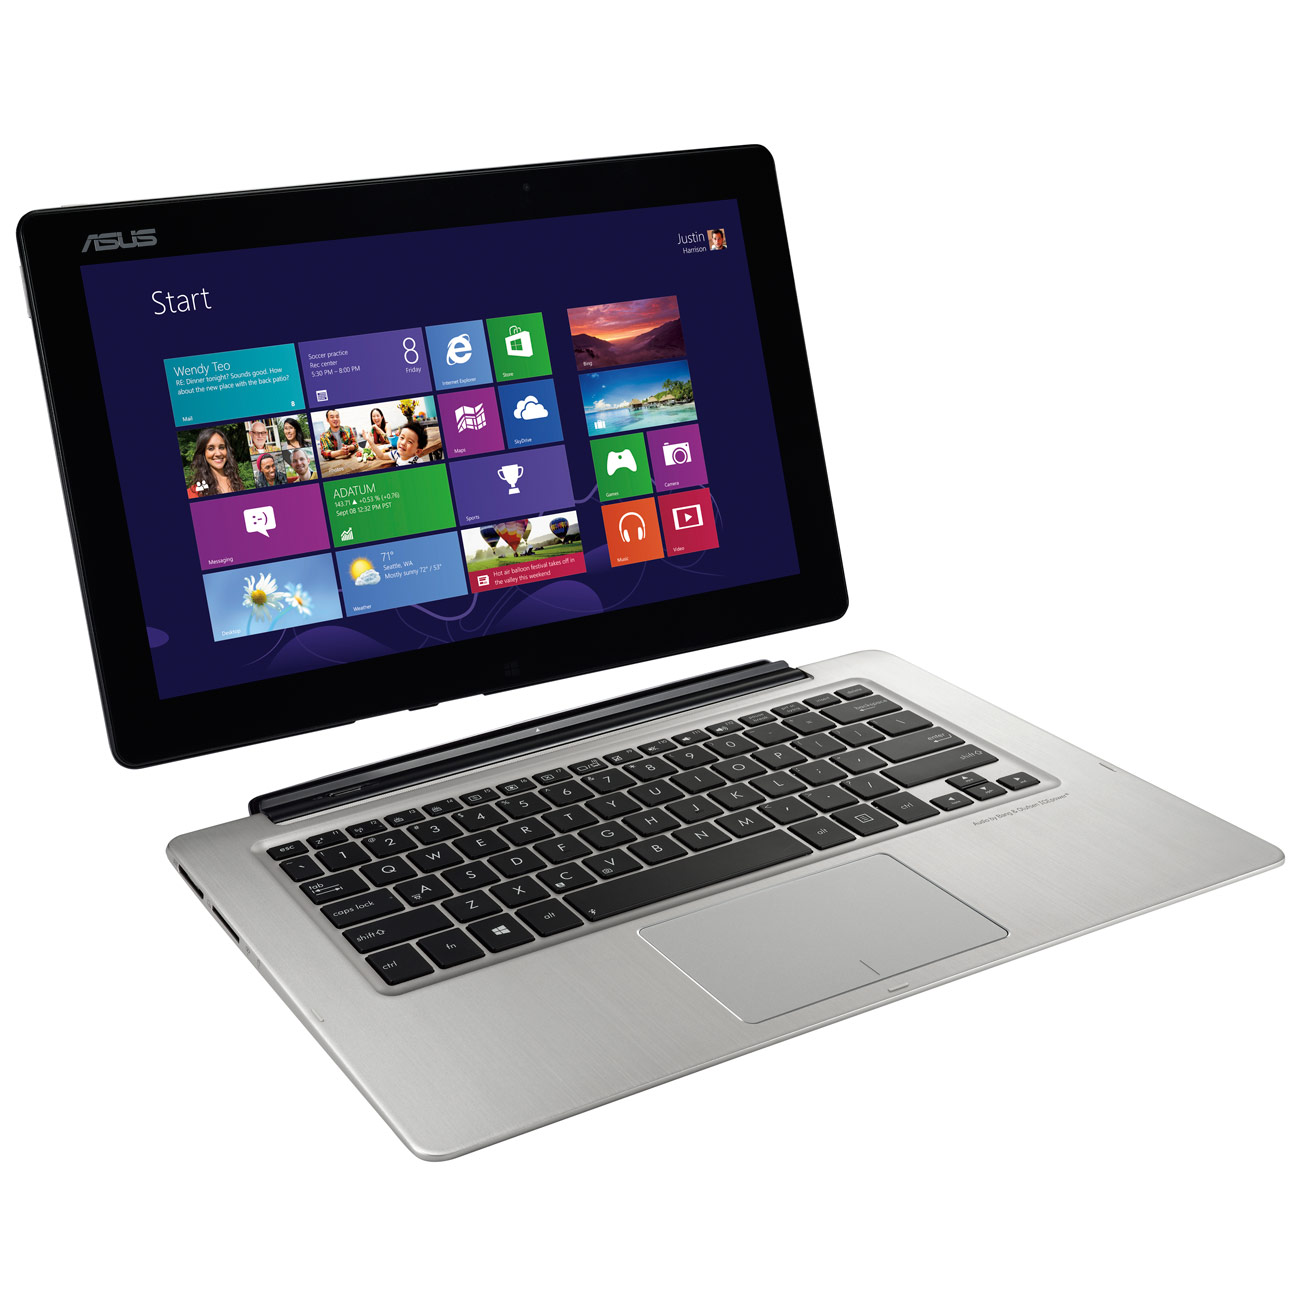 Asus transformer book tx300ca c4006h dock mobile - Tablette asus pas cher ...